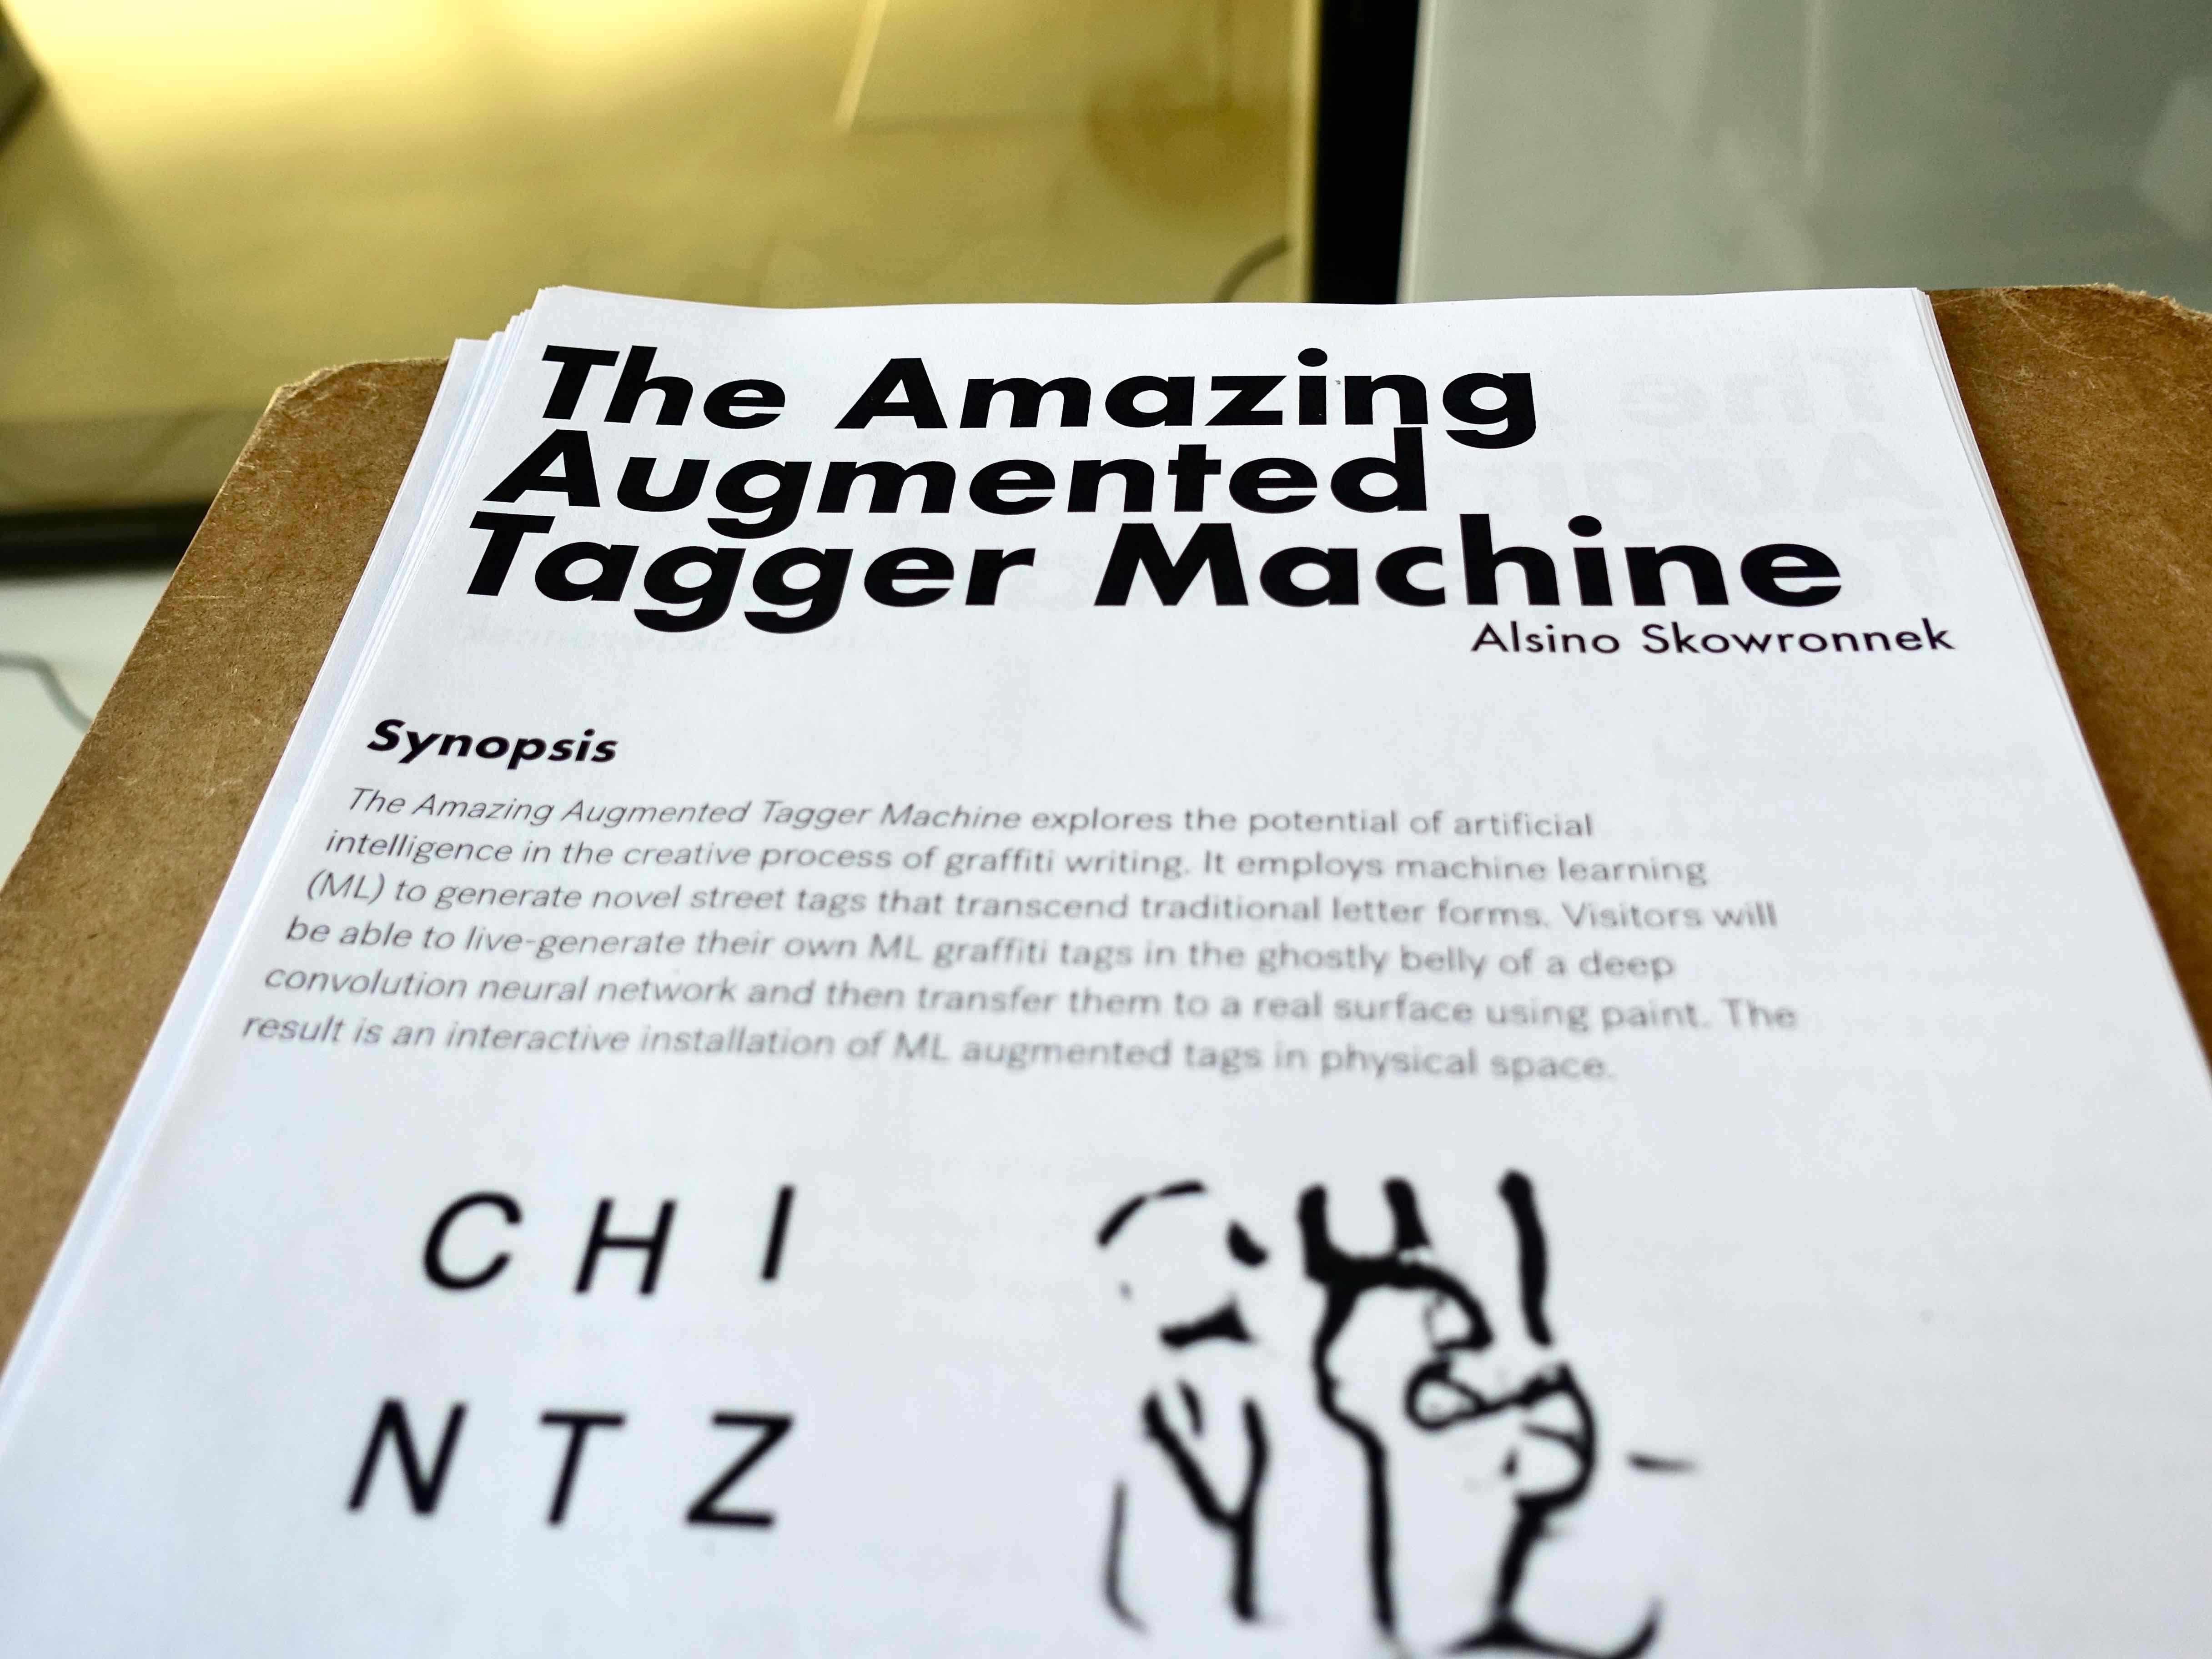 alsino skowronnek The Amazing Augmented Tagger Machine – Pt 2: The Wall